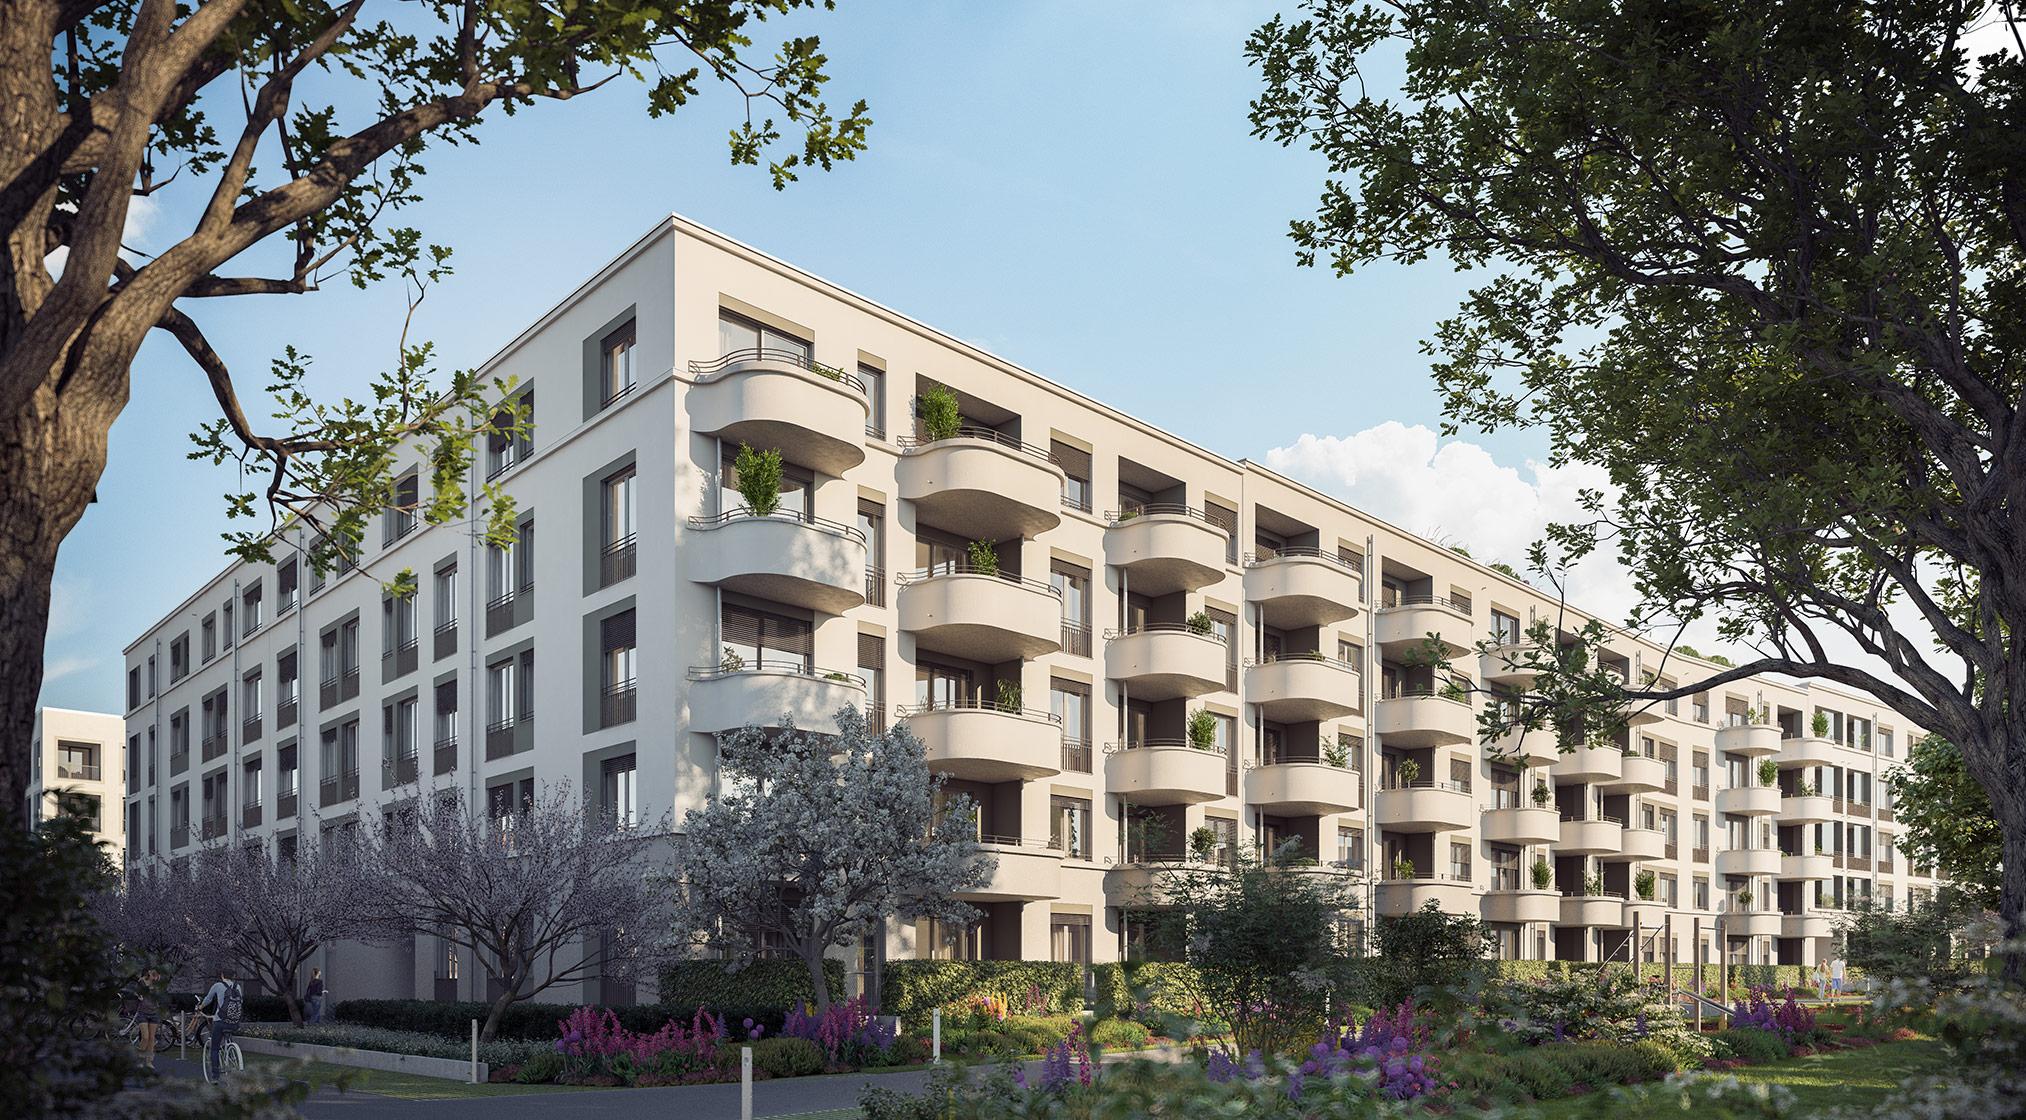 Condominiums Alexisquartier - Das Duett - Project details - illustration 1